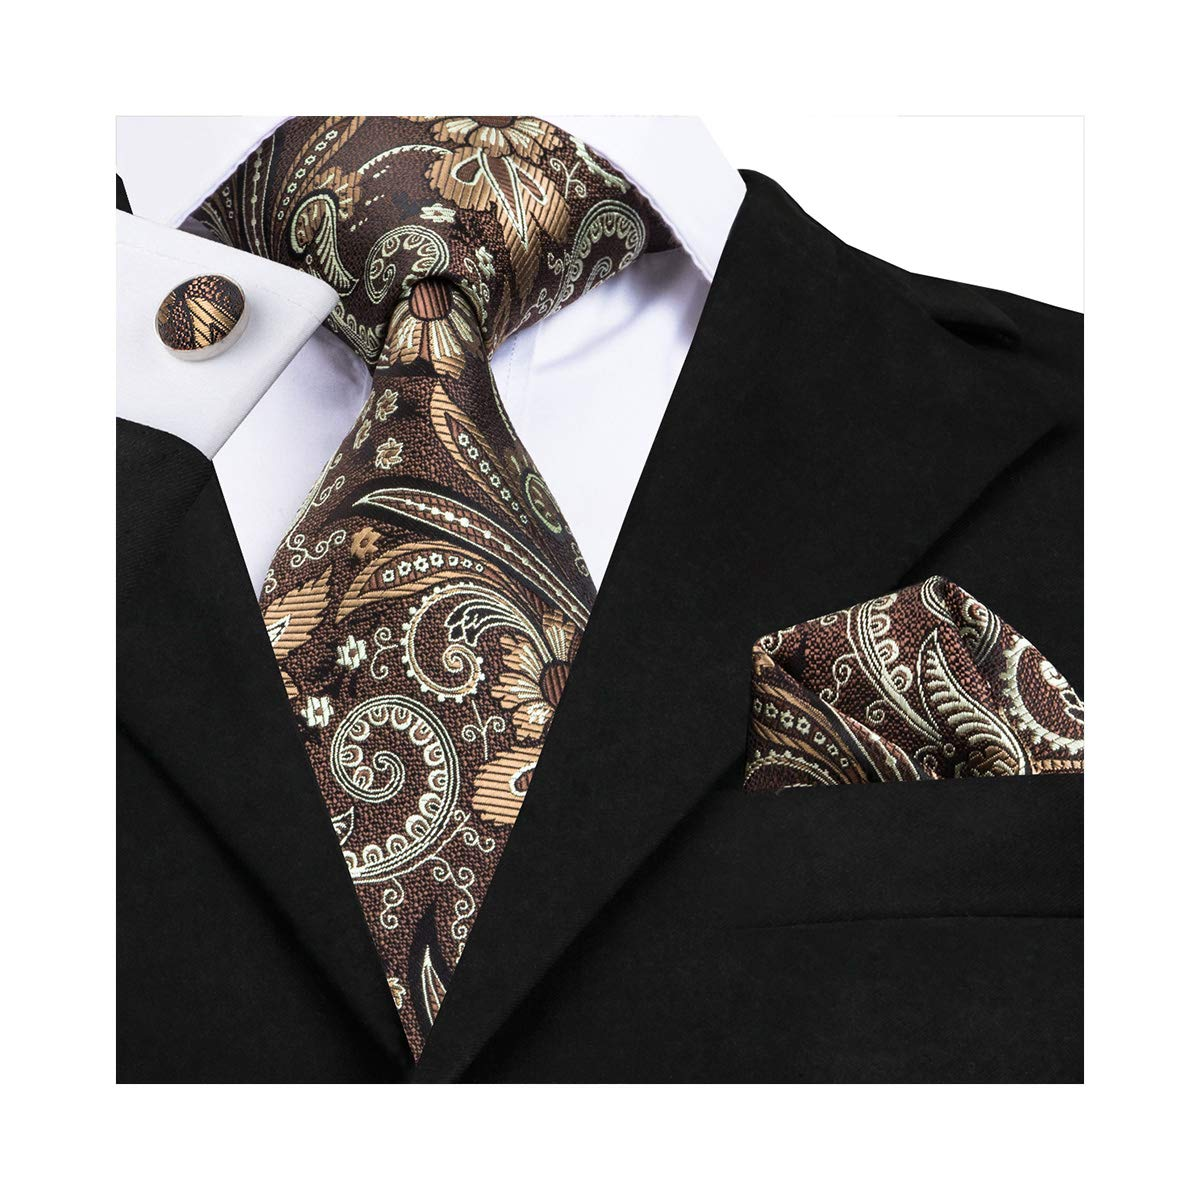 fashion paisley tie set handkerchief cufflinks necktie set brown flower wedding ties by Barry.Wang (Image #1)